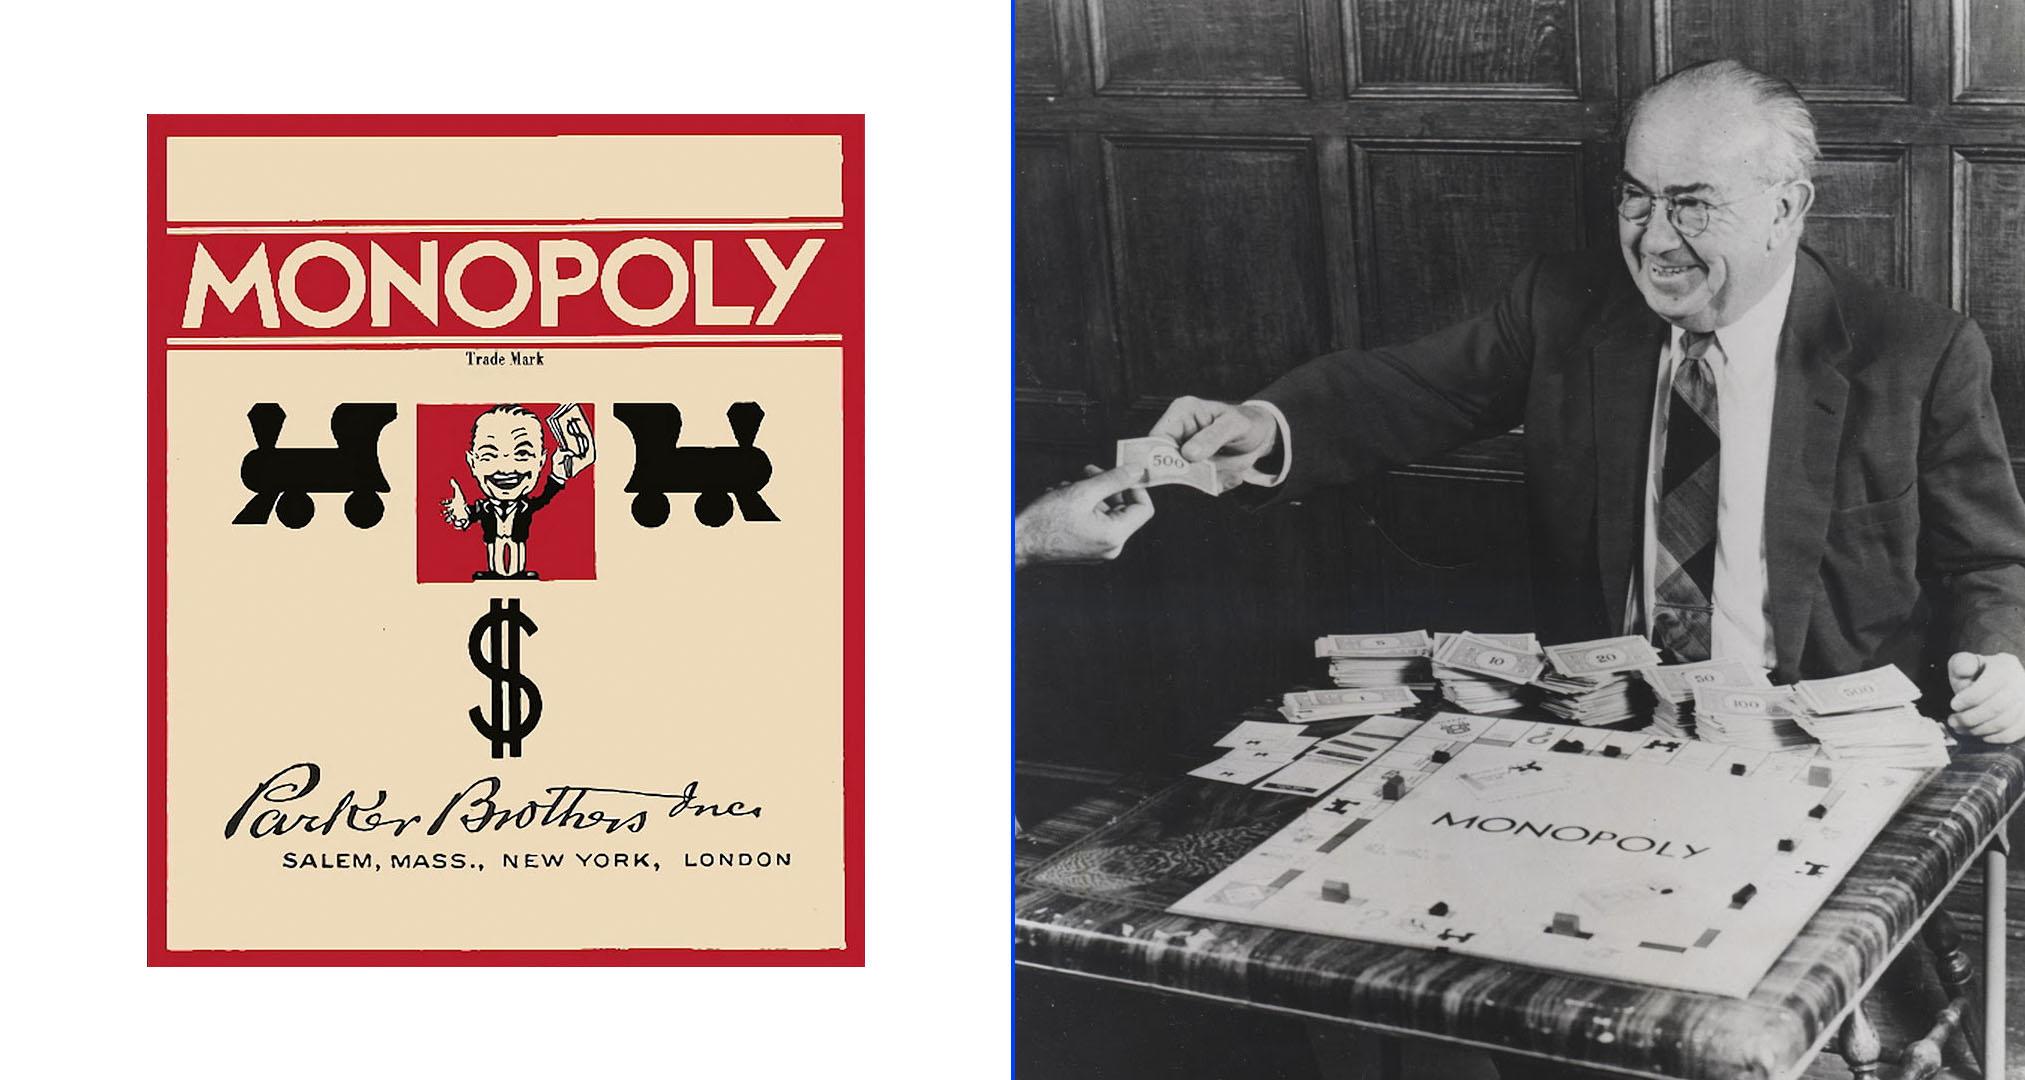 Charles Darrow, el hombre que plagió el Monopoly